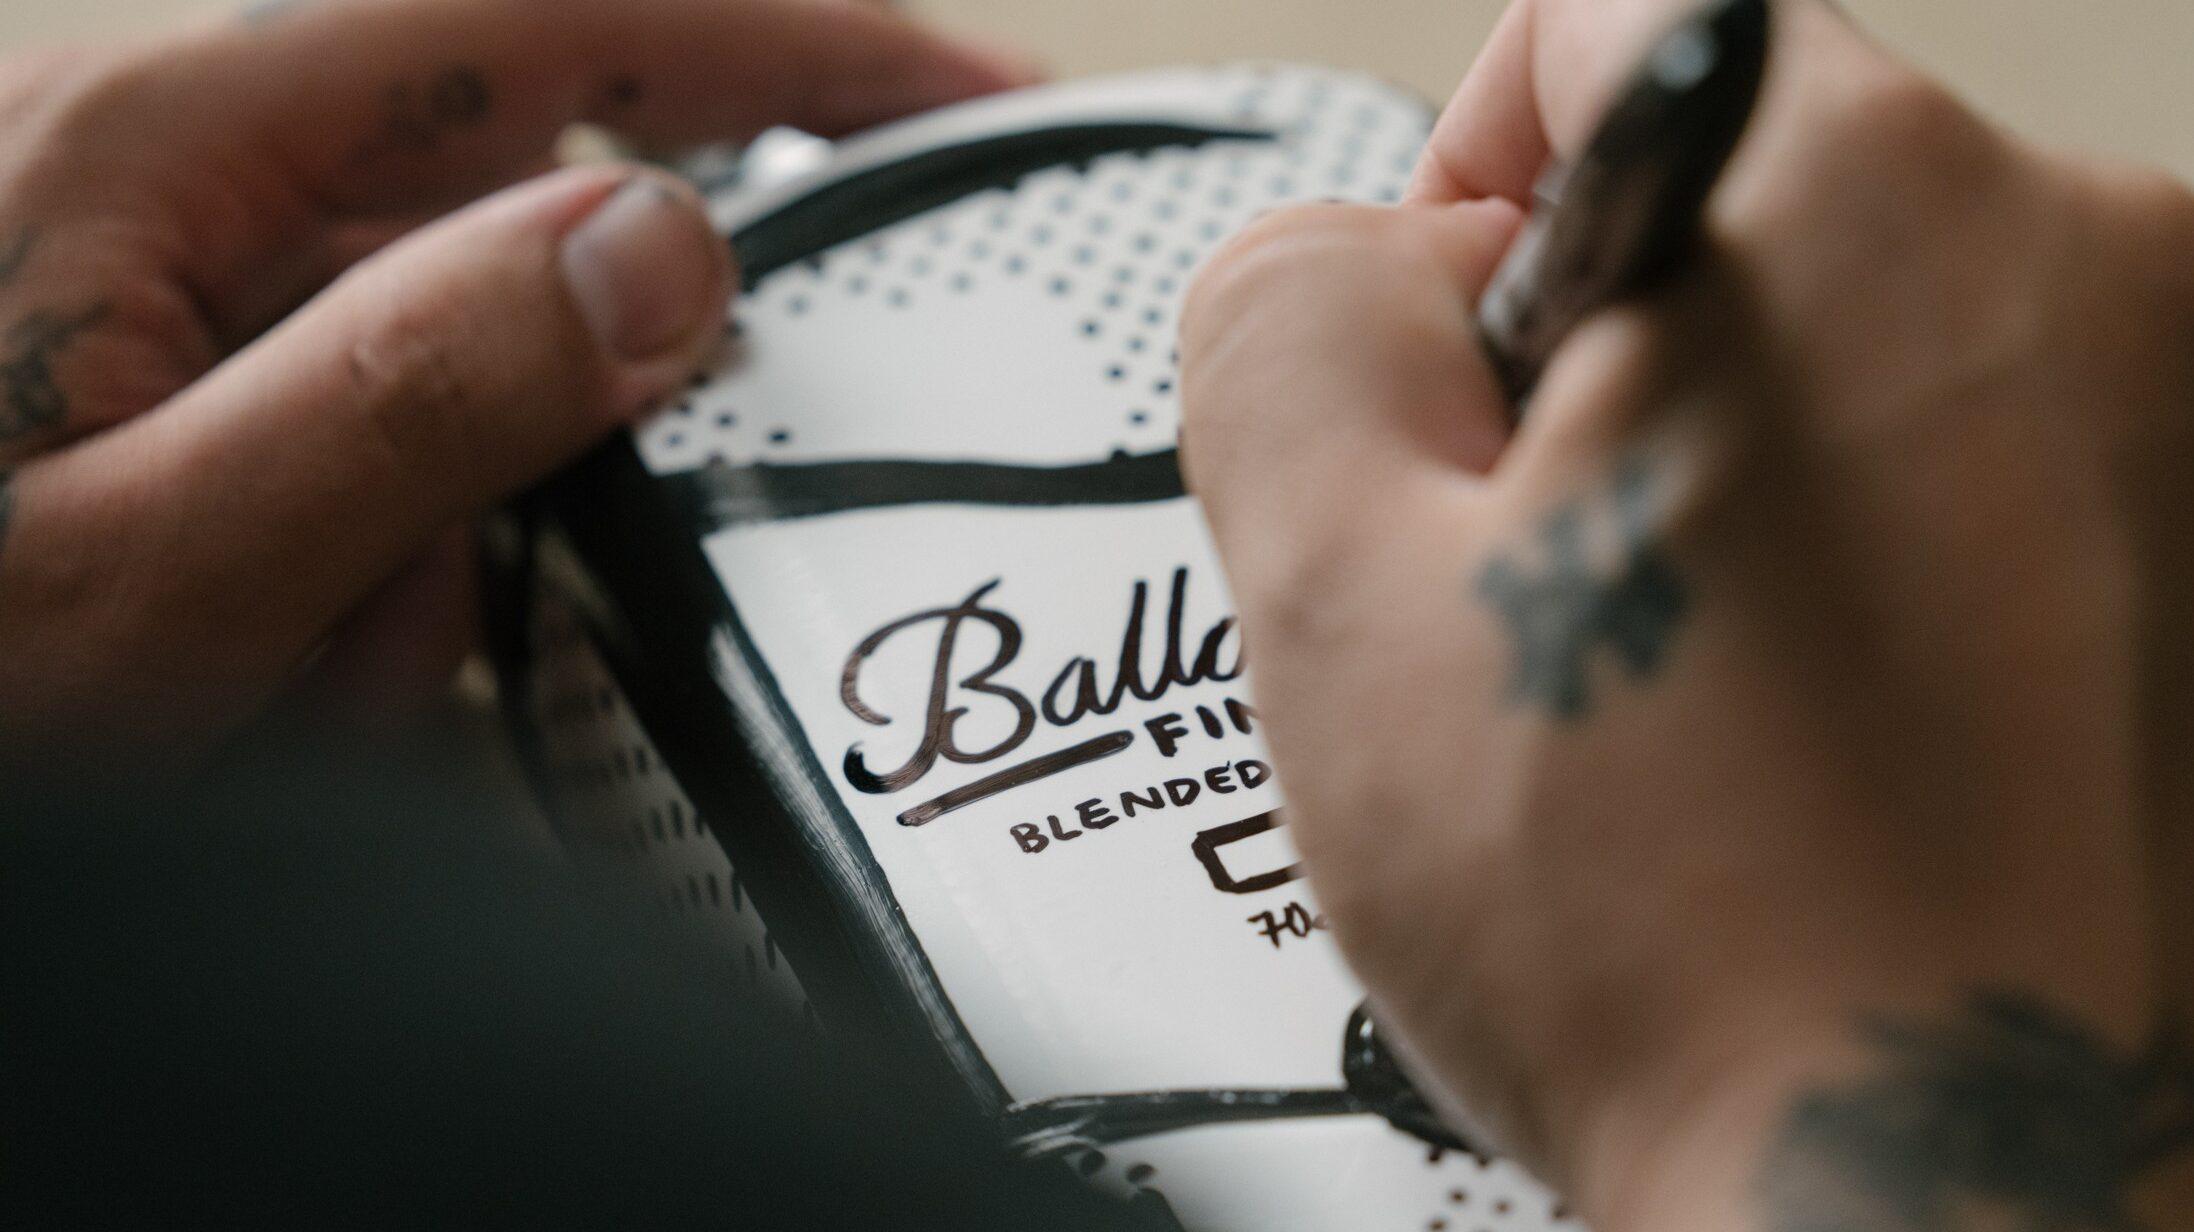 Joshua Vides Signature on Ballantines bottle